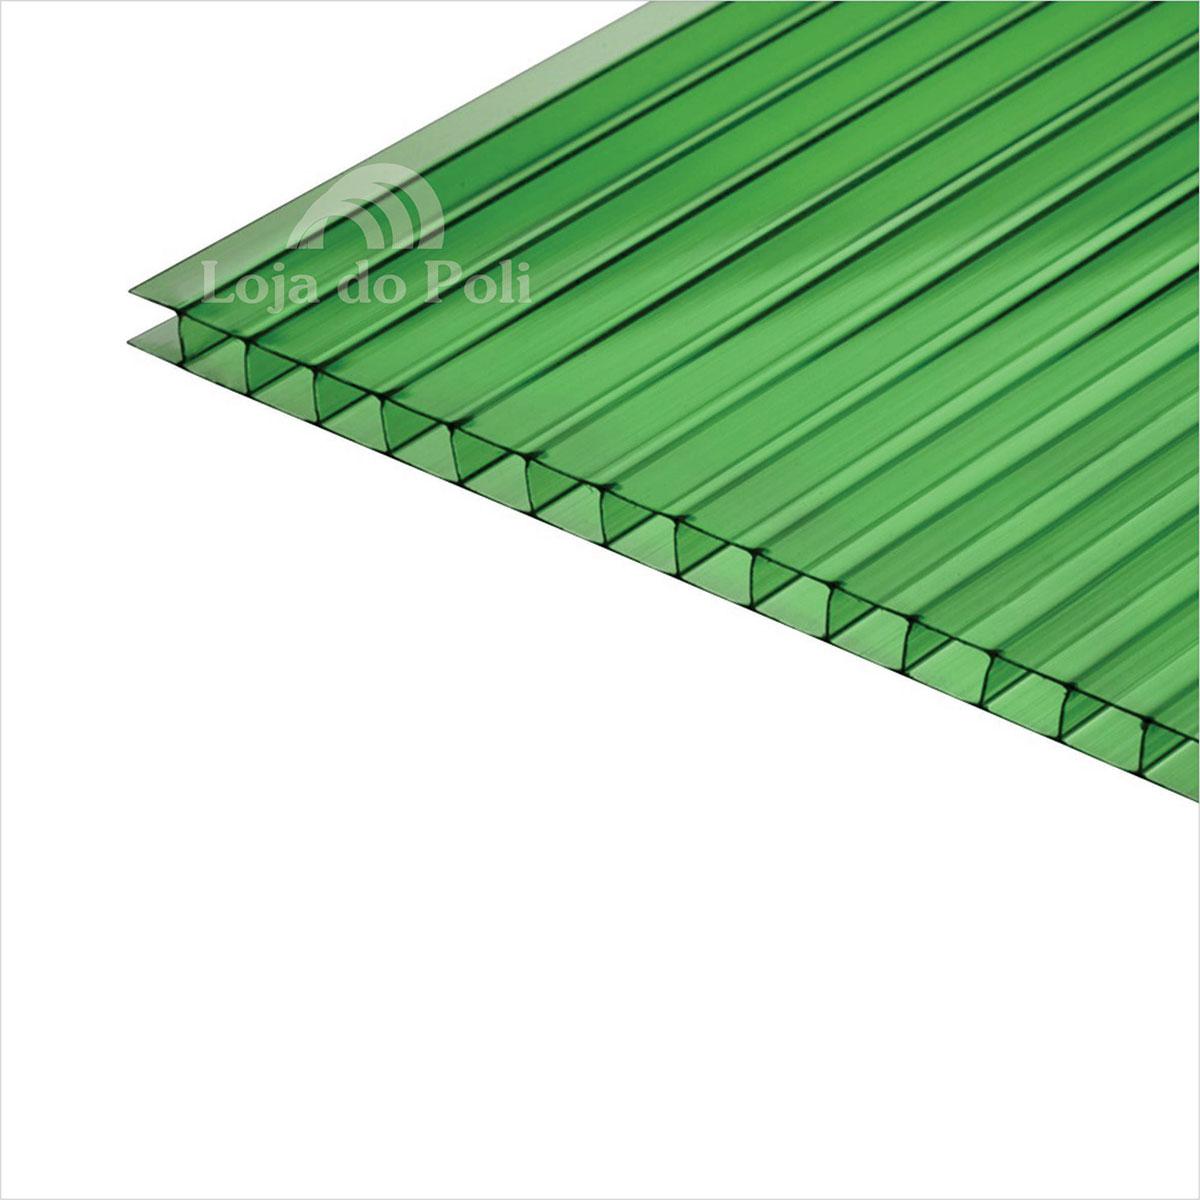 Chapa Policarbonato Alveolar Verde 6mm 1,0x6,0m